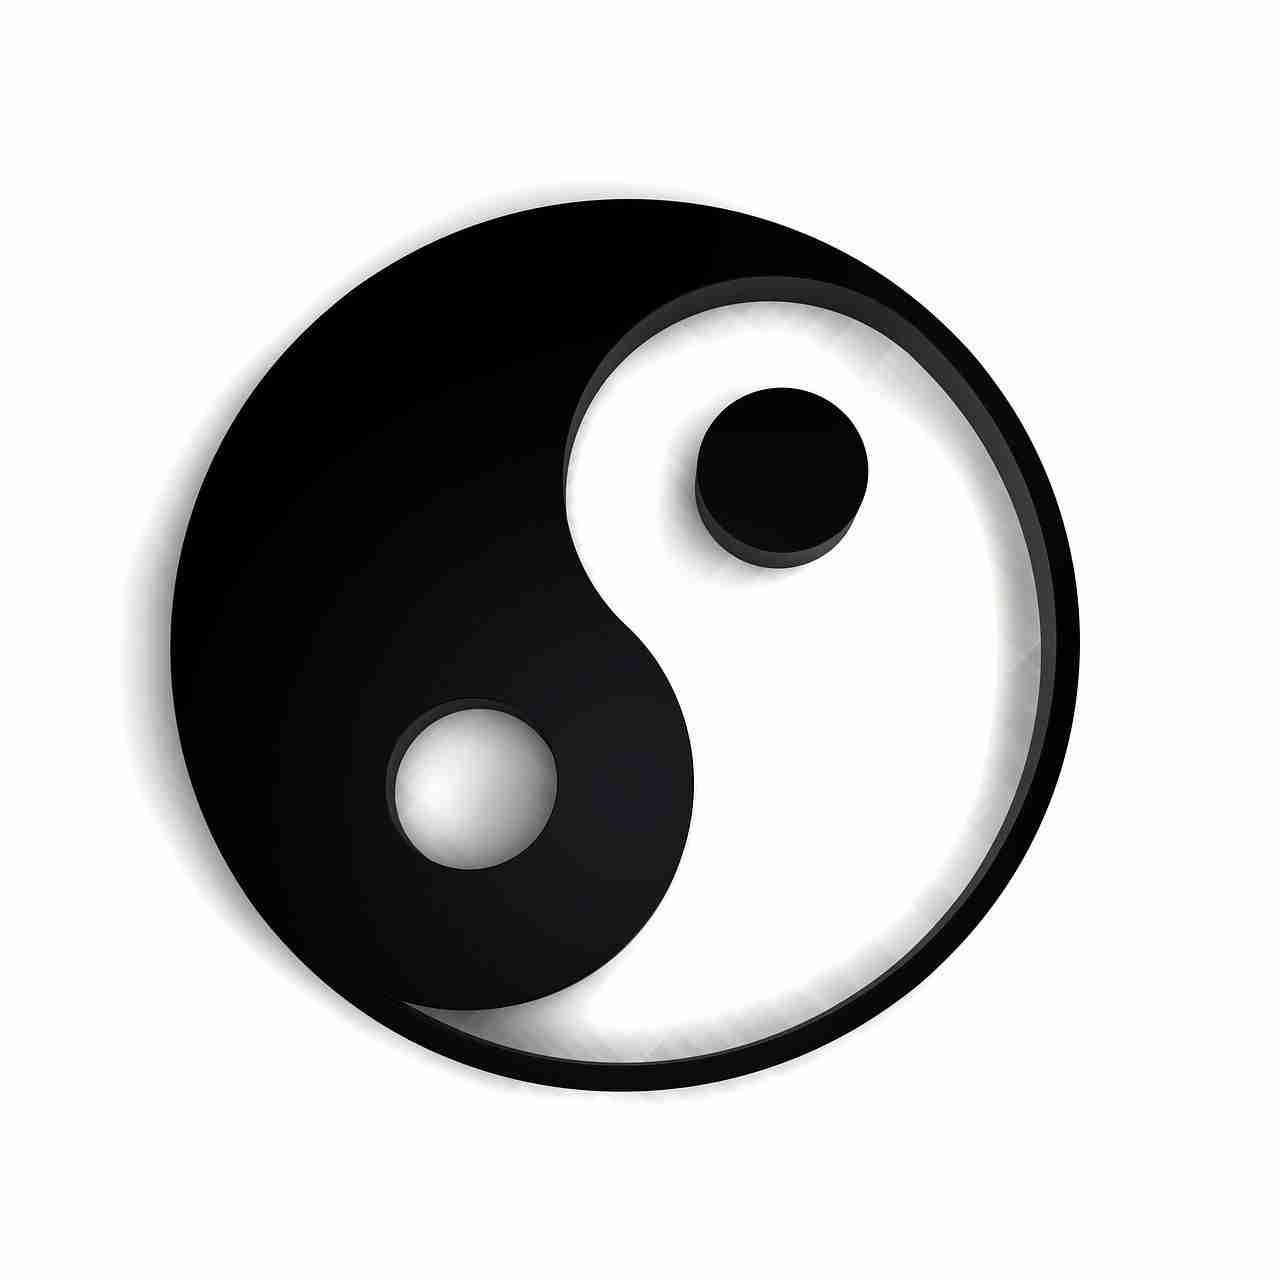 yin yang symbol black and white